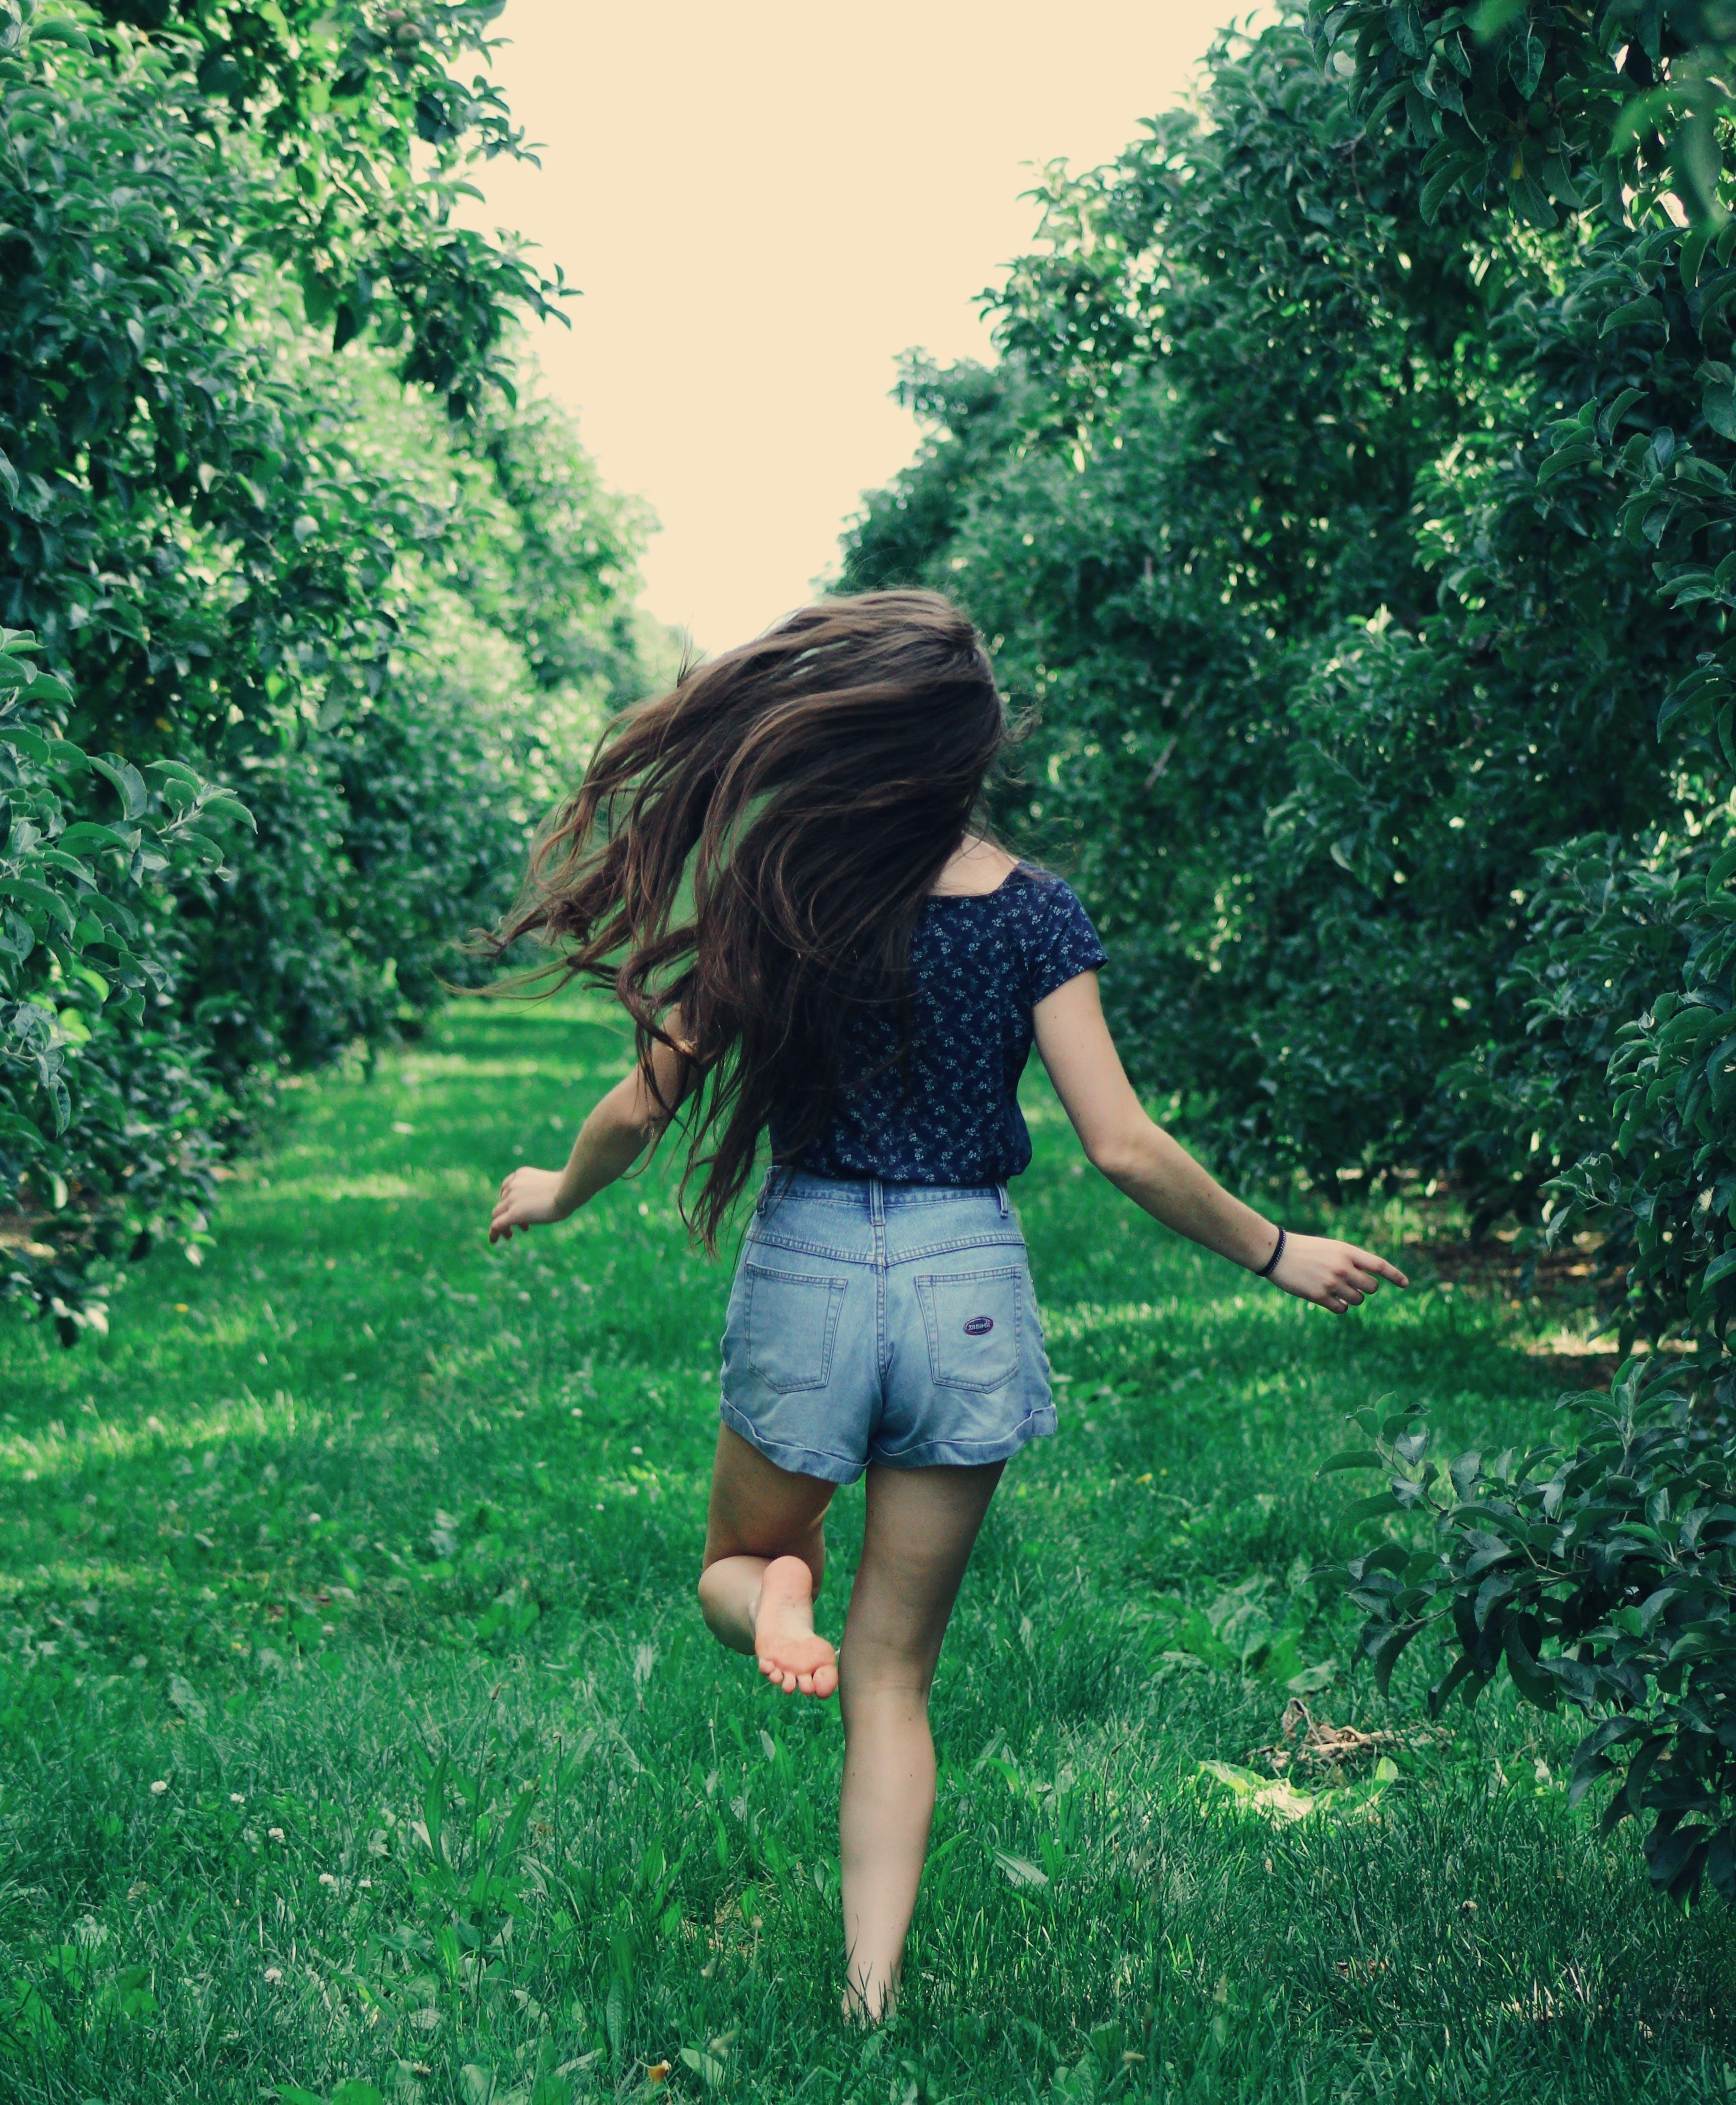 Photo of a Woman Running on Green Grass